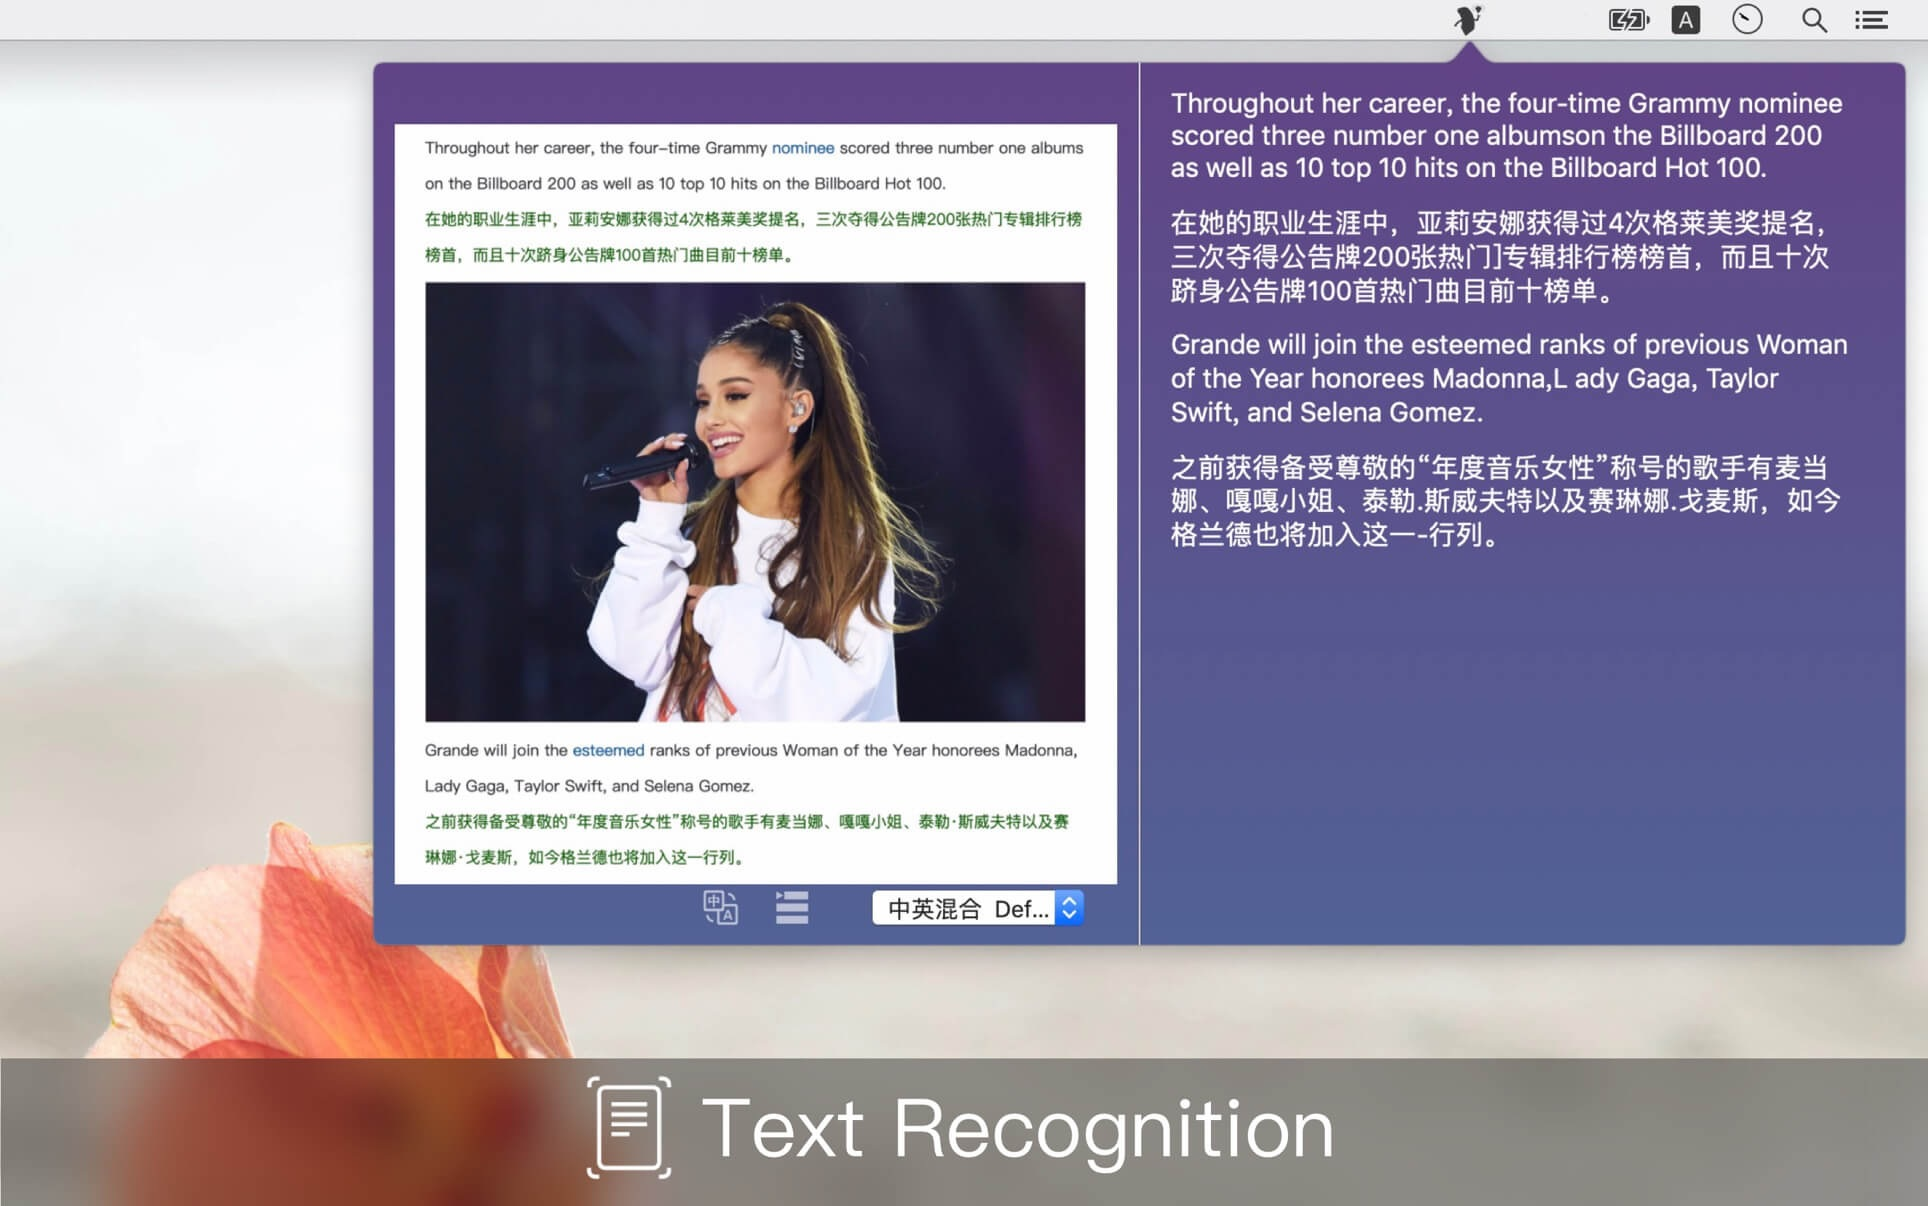 OCR文字识别软件 Text Scanner 破解版 for mac v1.1.2 中文破解版(附激活码)